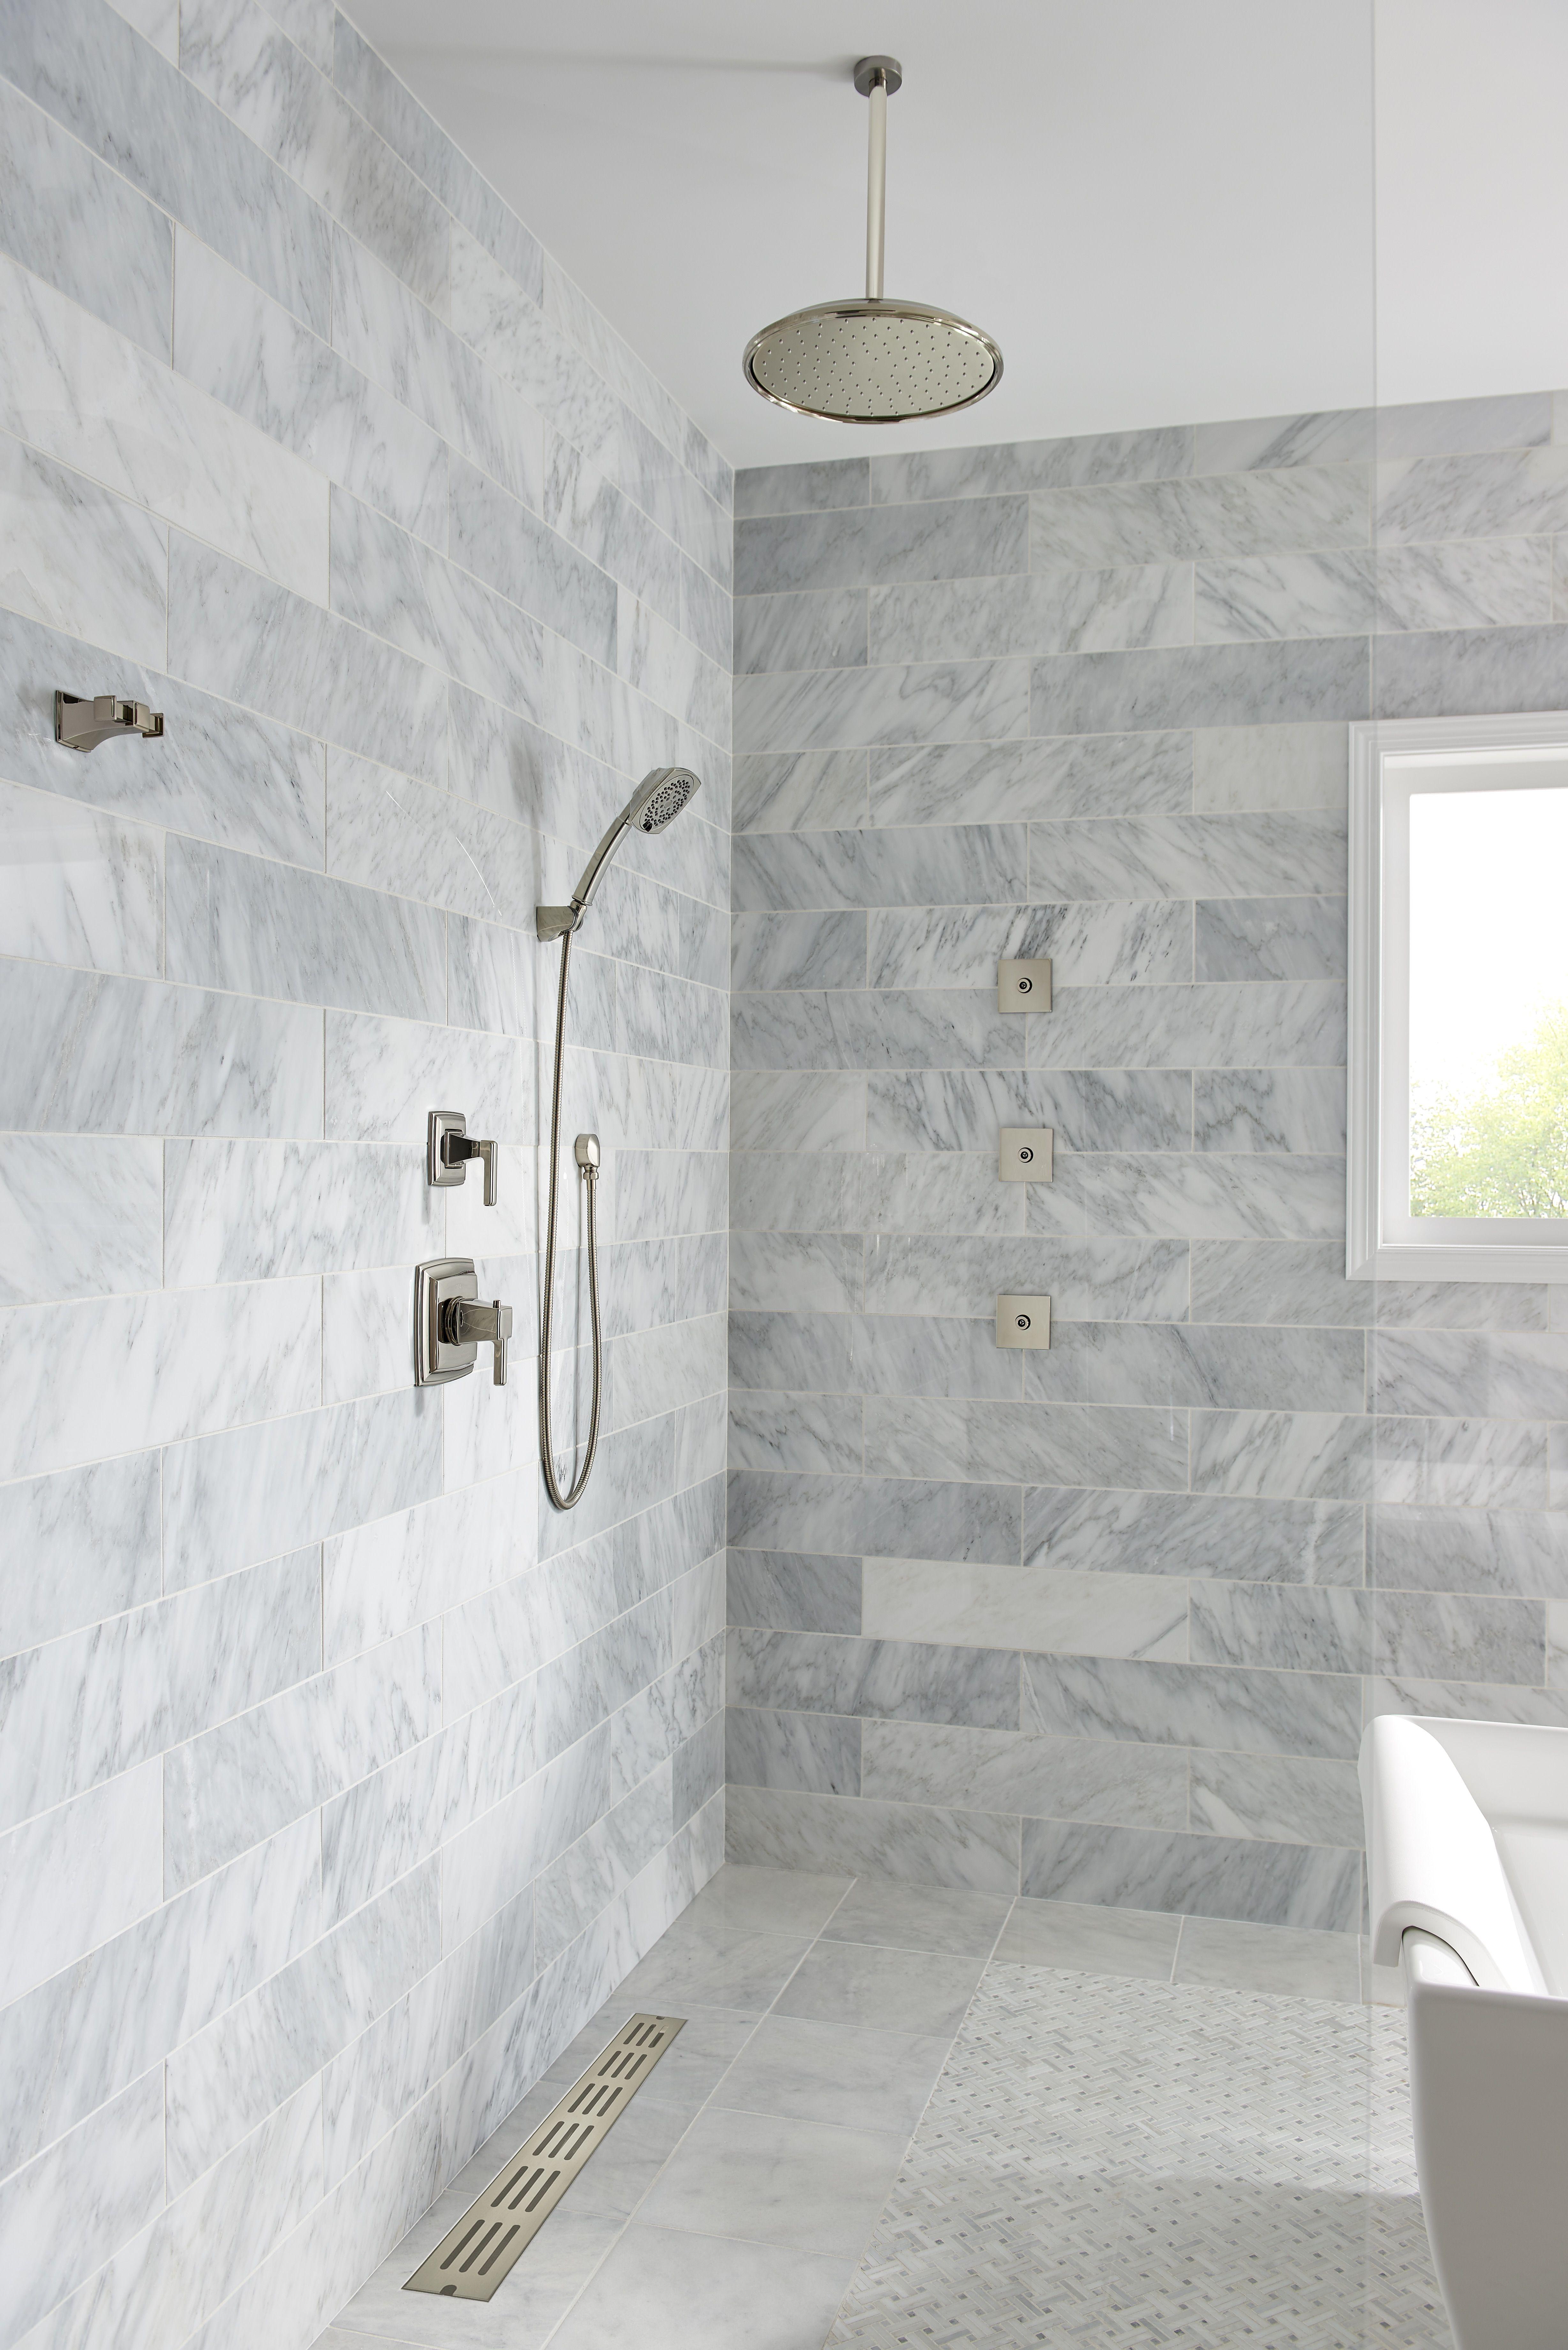 The Ultimate Shower Design Using Toto Products Bathroom Bathroomreno Bathroomgoals Renovation Sho Bathroom Decor Small Bathroom Decor Diy Bathroom Design